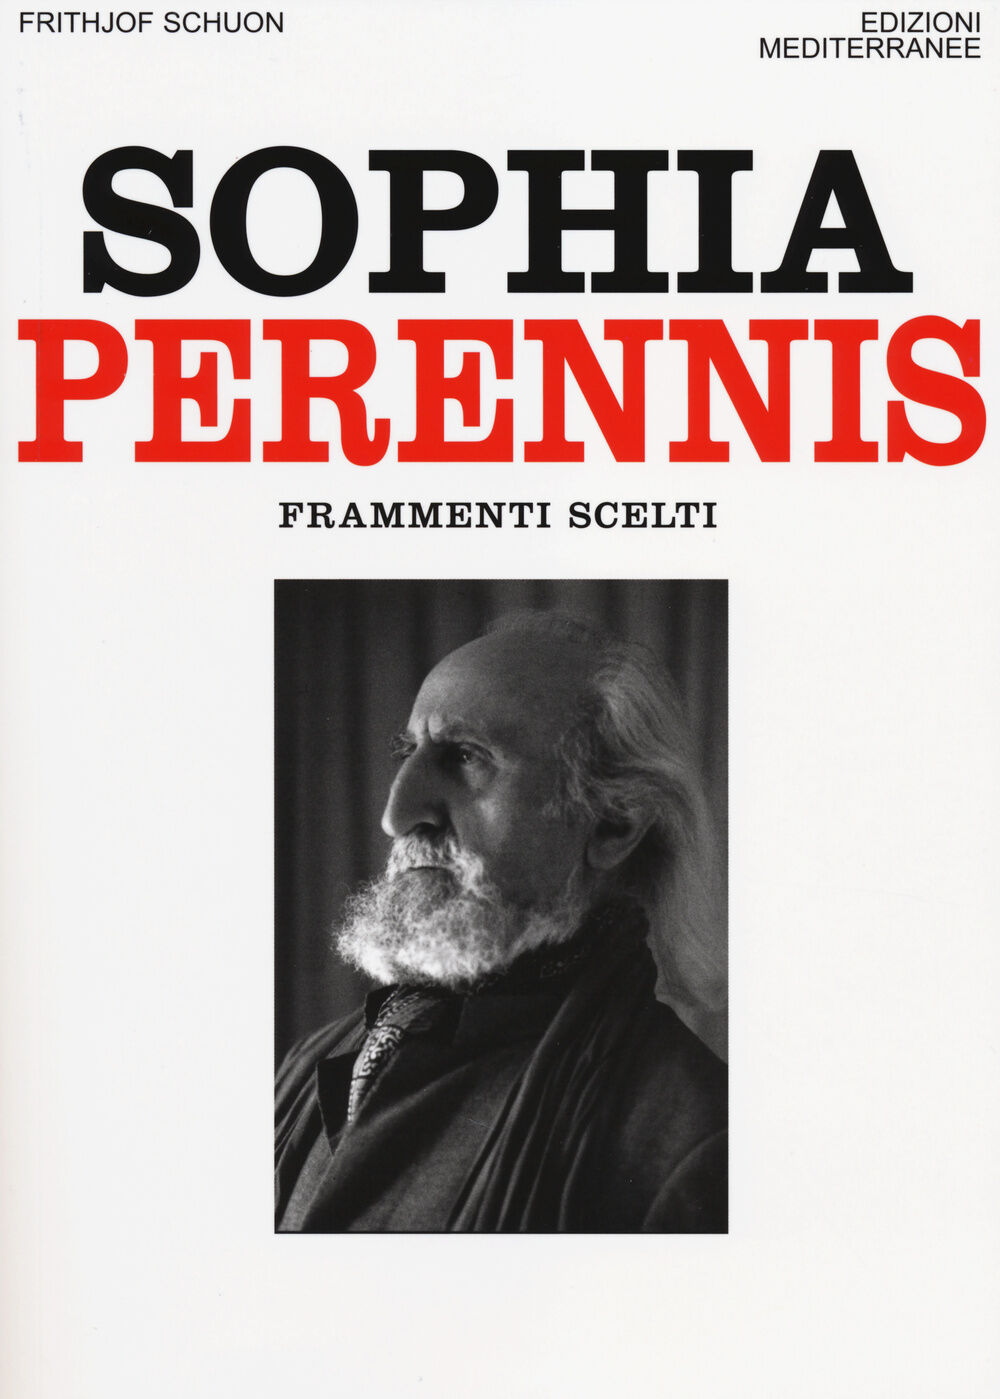 Sophia Perennis. Frammenti scelti